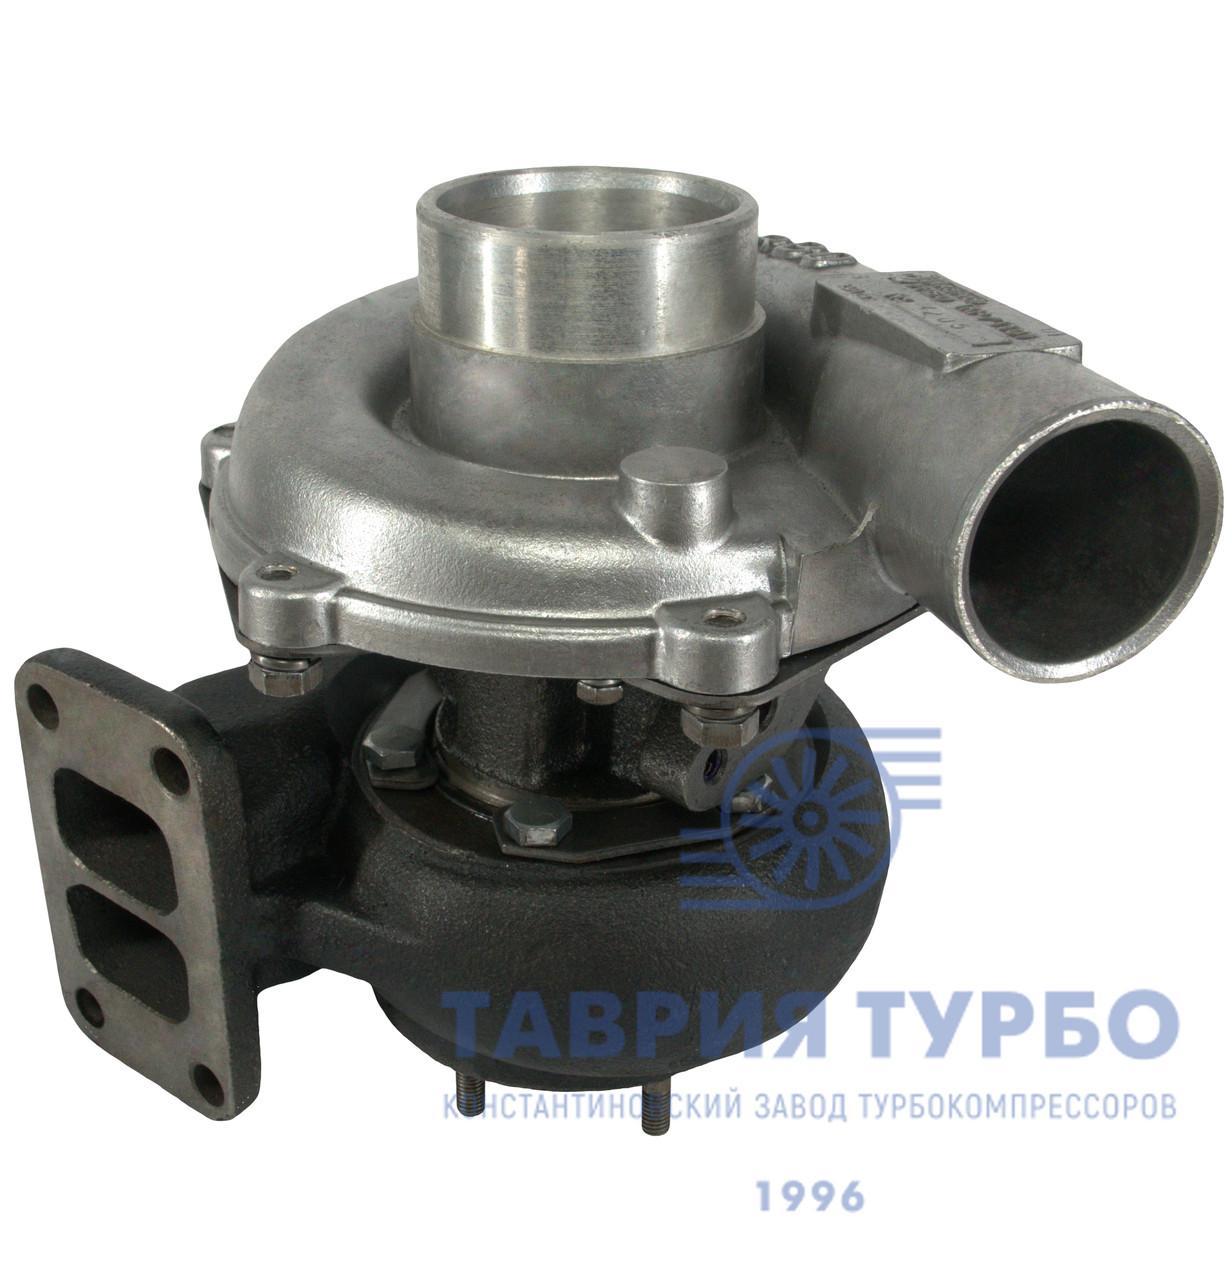 Турбокомпрессор ТКР 7TT-01.05 правый, Турбина на КамАЗ, ПАЗ, НефАЗ; Двигатель КамАЗ 740.30, -740.31, -740.50